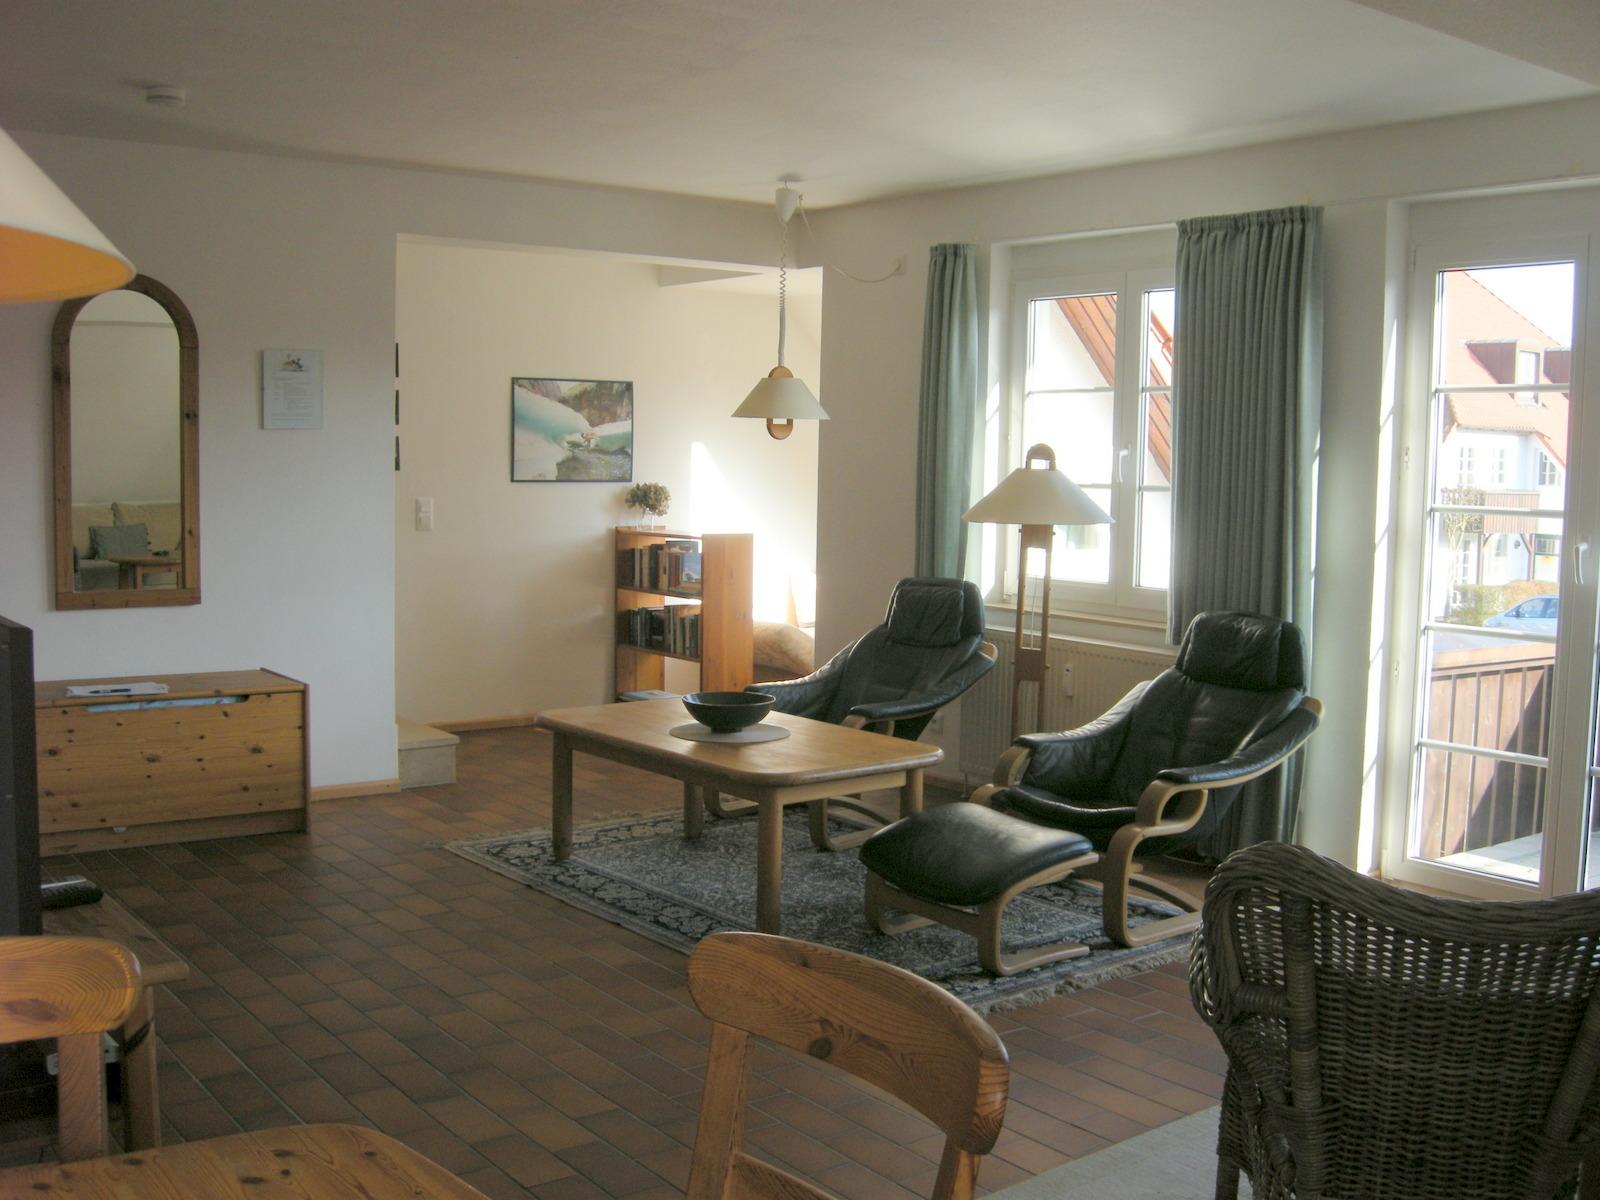 Ferienwohnung I05 Residenz Kormoran in Prerow | FUNKEs Ferien